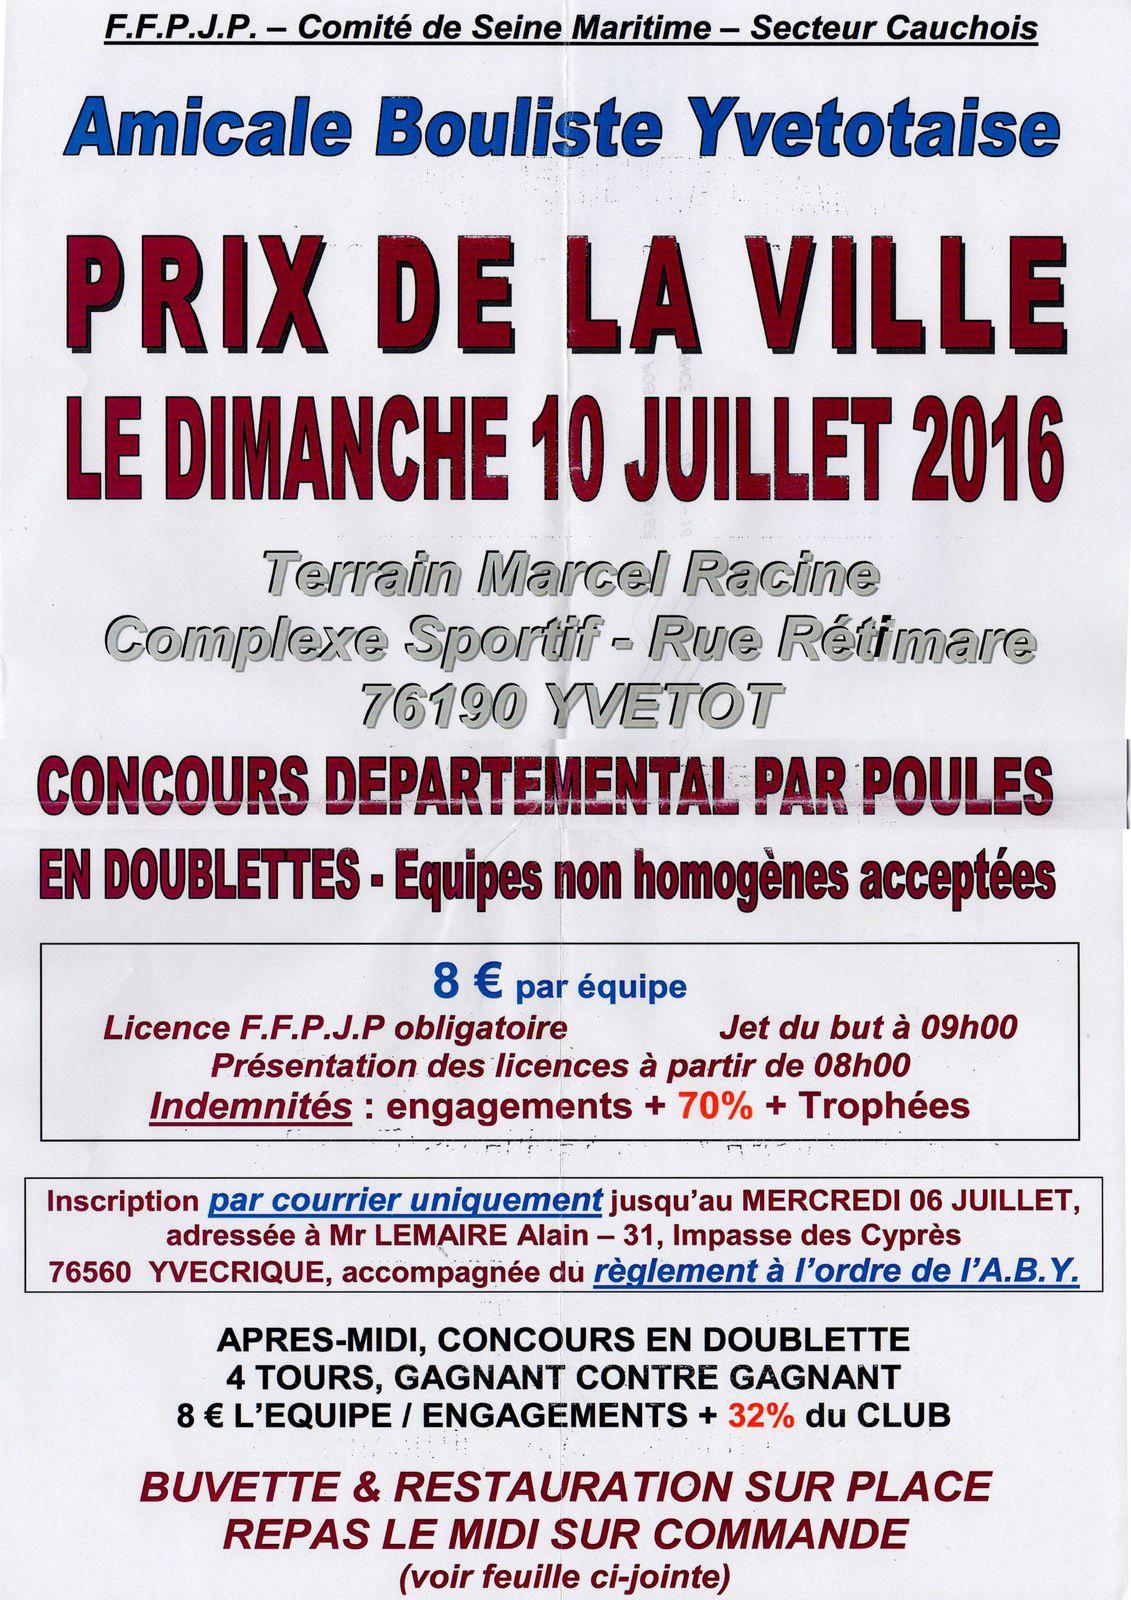 2016-07-10 Yvetot - Doublette - Prix de la Ville